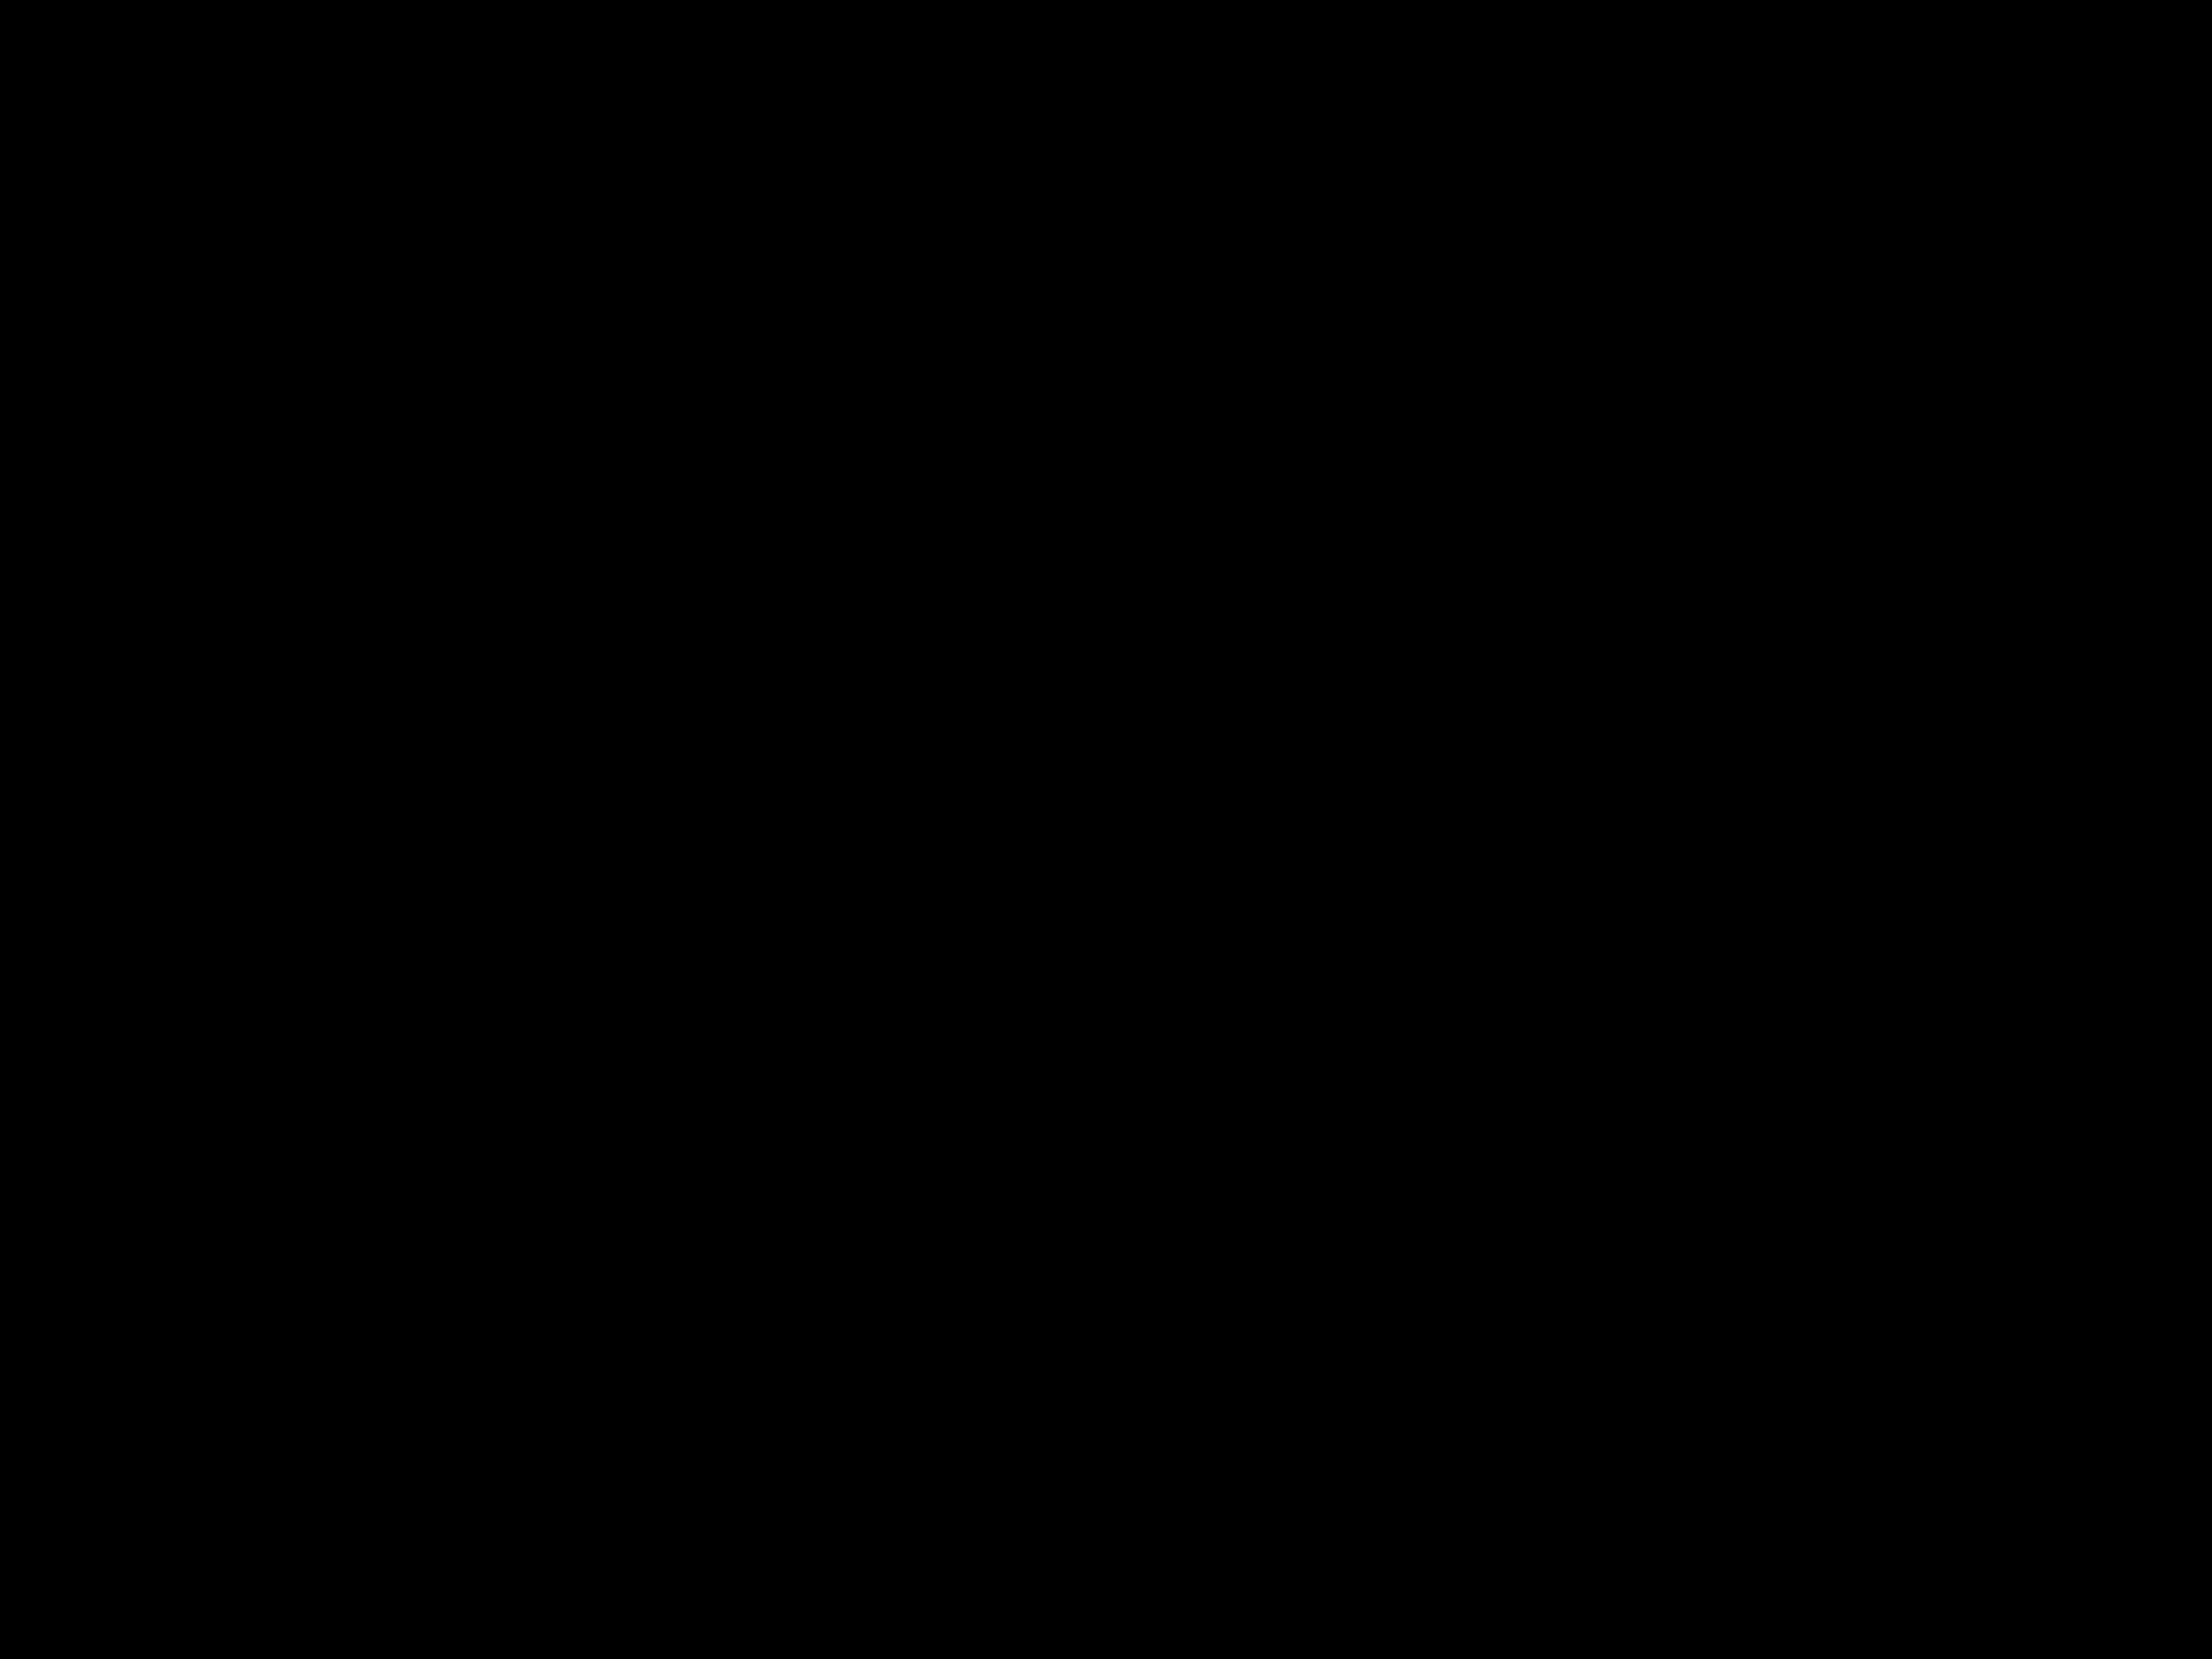 Logo_Bene_PRINT_B.png